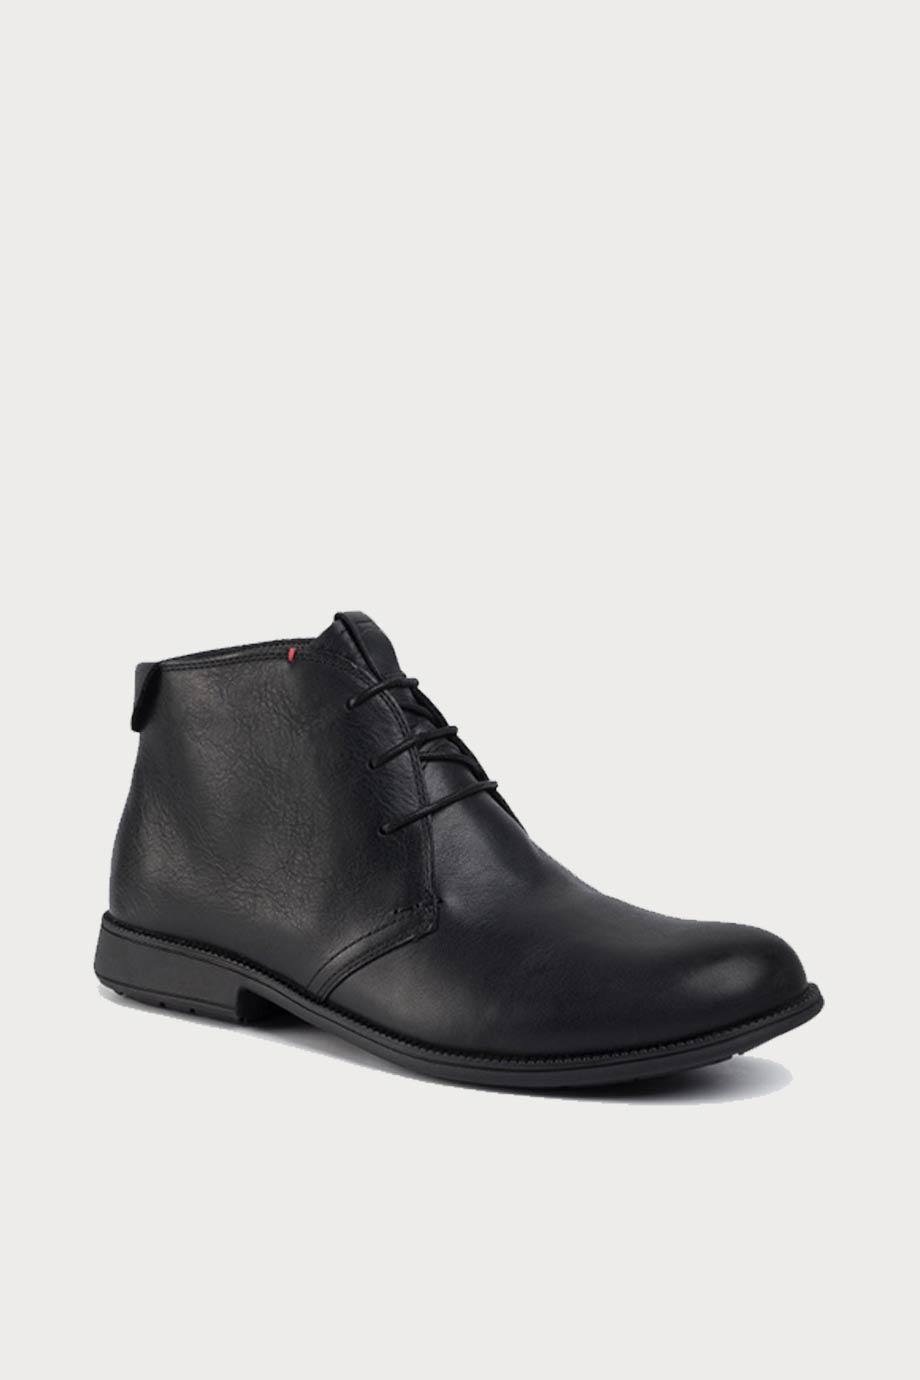 spiridoula metheniti shoes xalkida p Camper 36587 022 1913